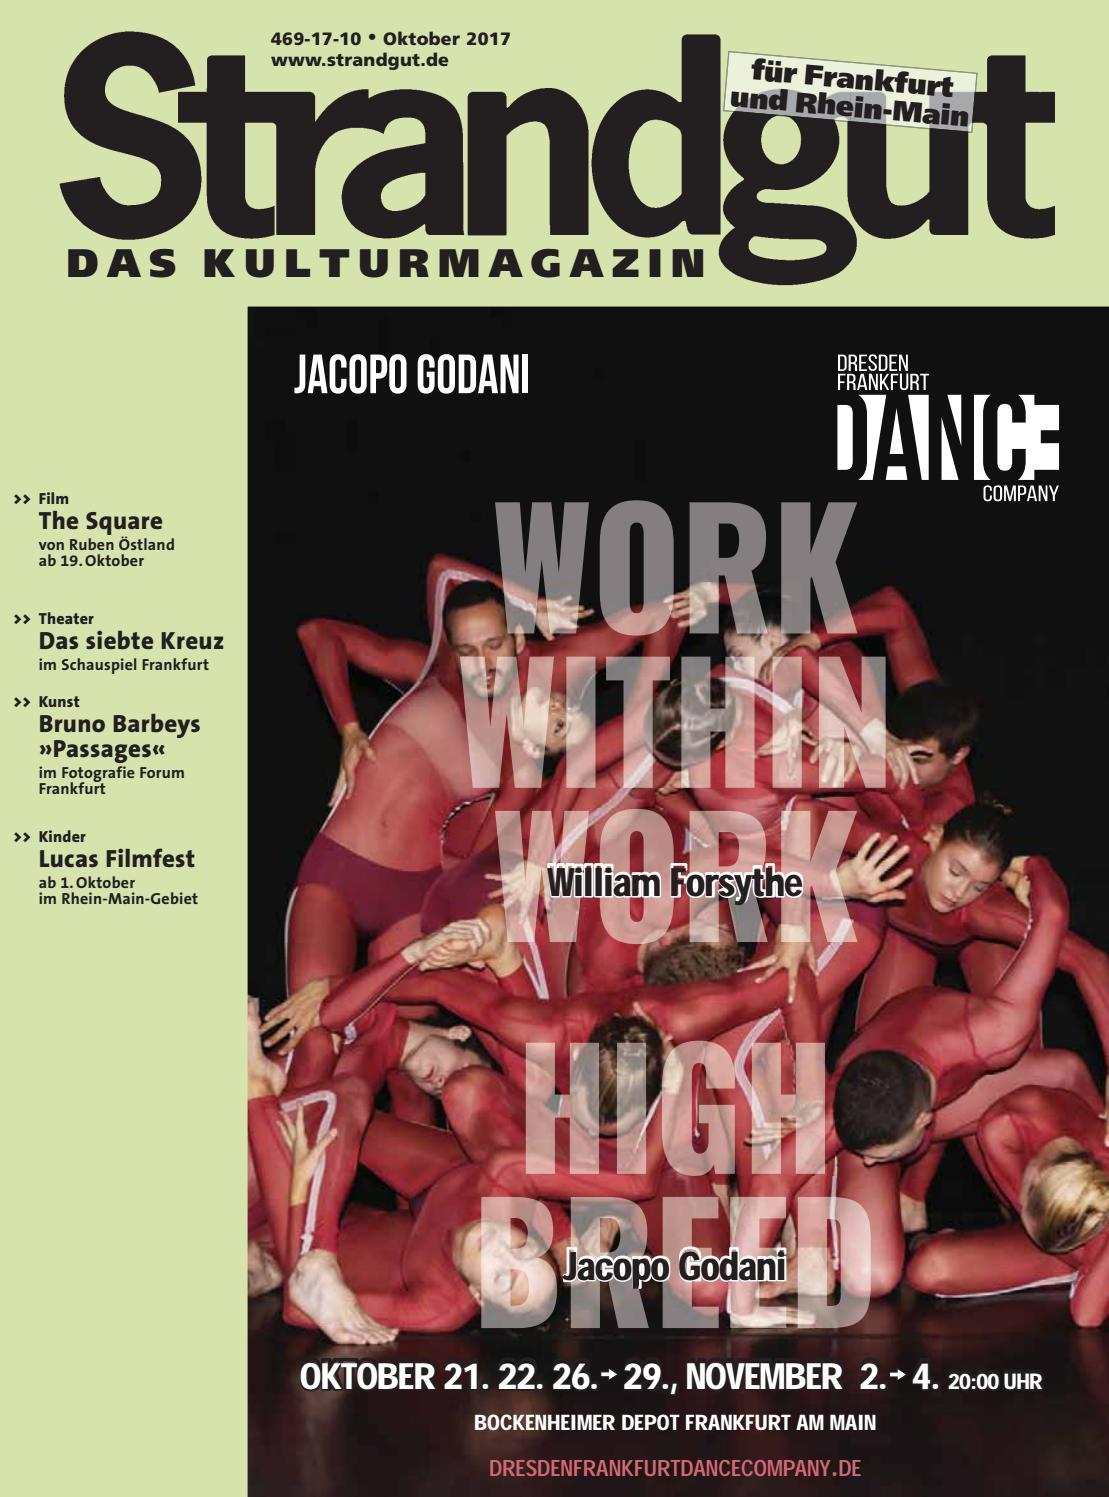 Strandgut 102017 By Strandgut Kulturmagazin Issuu